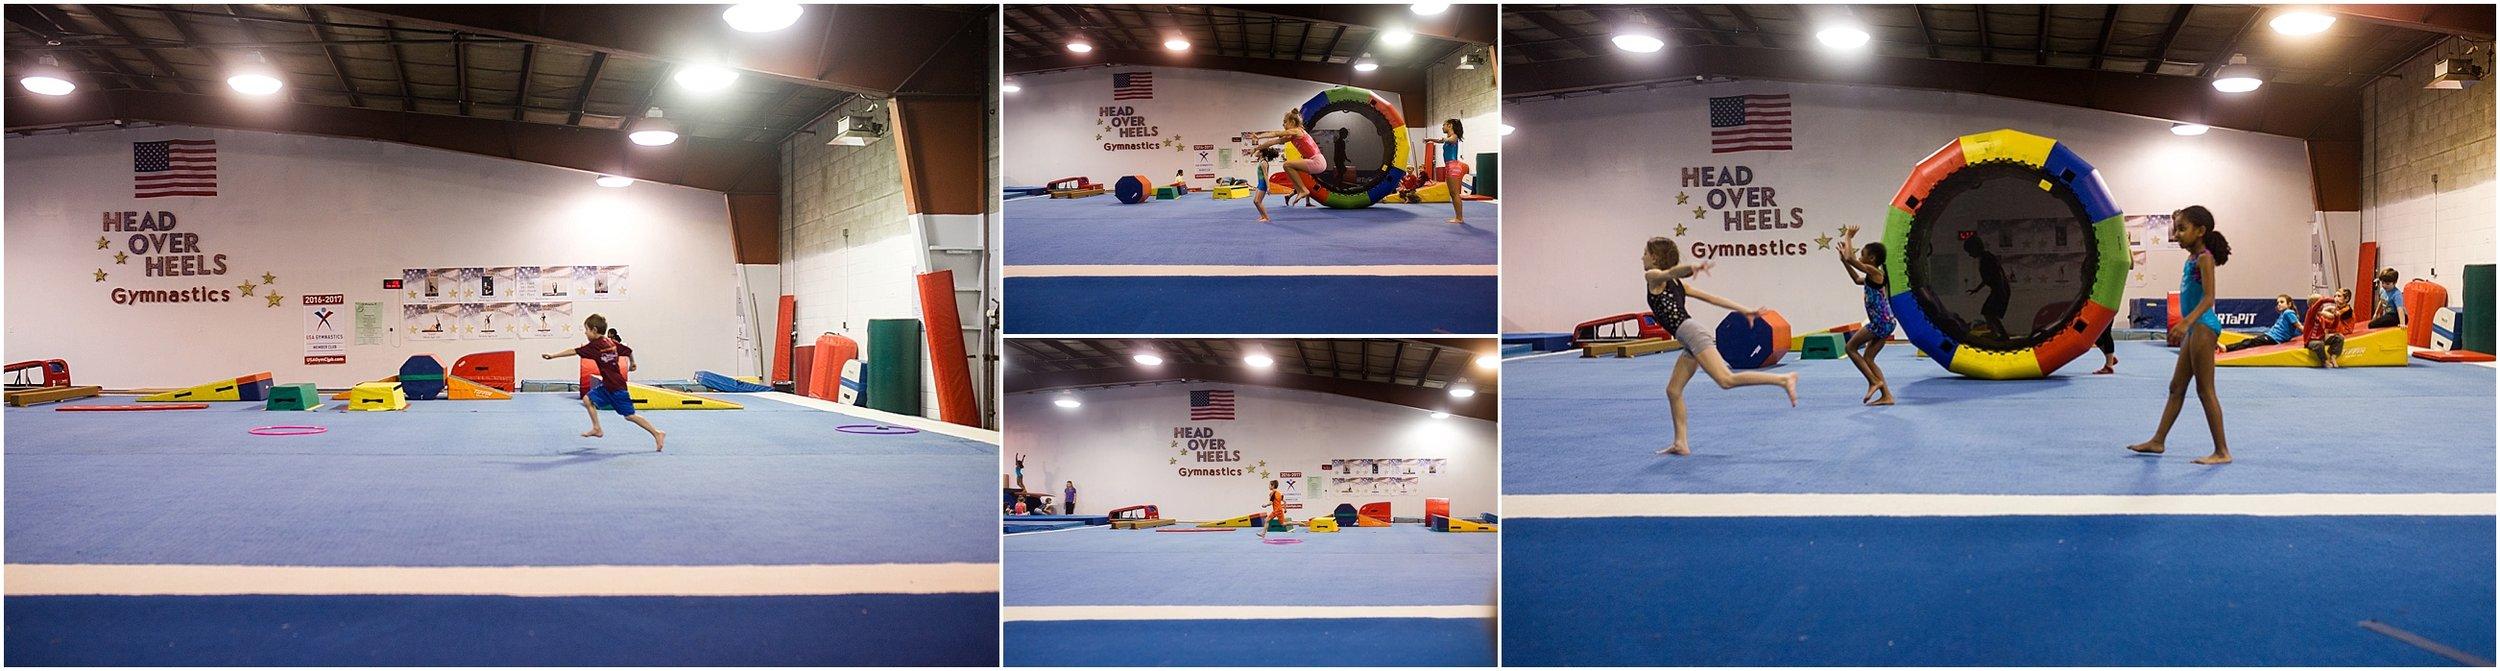 Head Over Heels Gymnastics, ninja class, Holli Pool Photography, Stuarts Draft, Virginia photographer